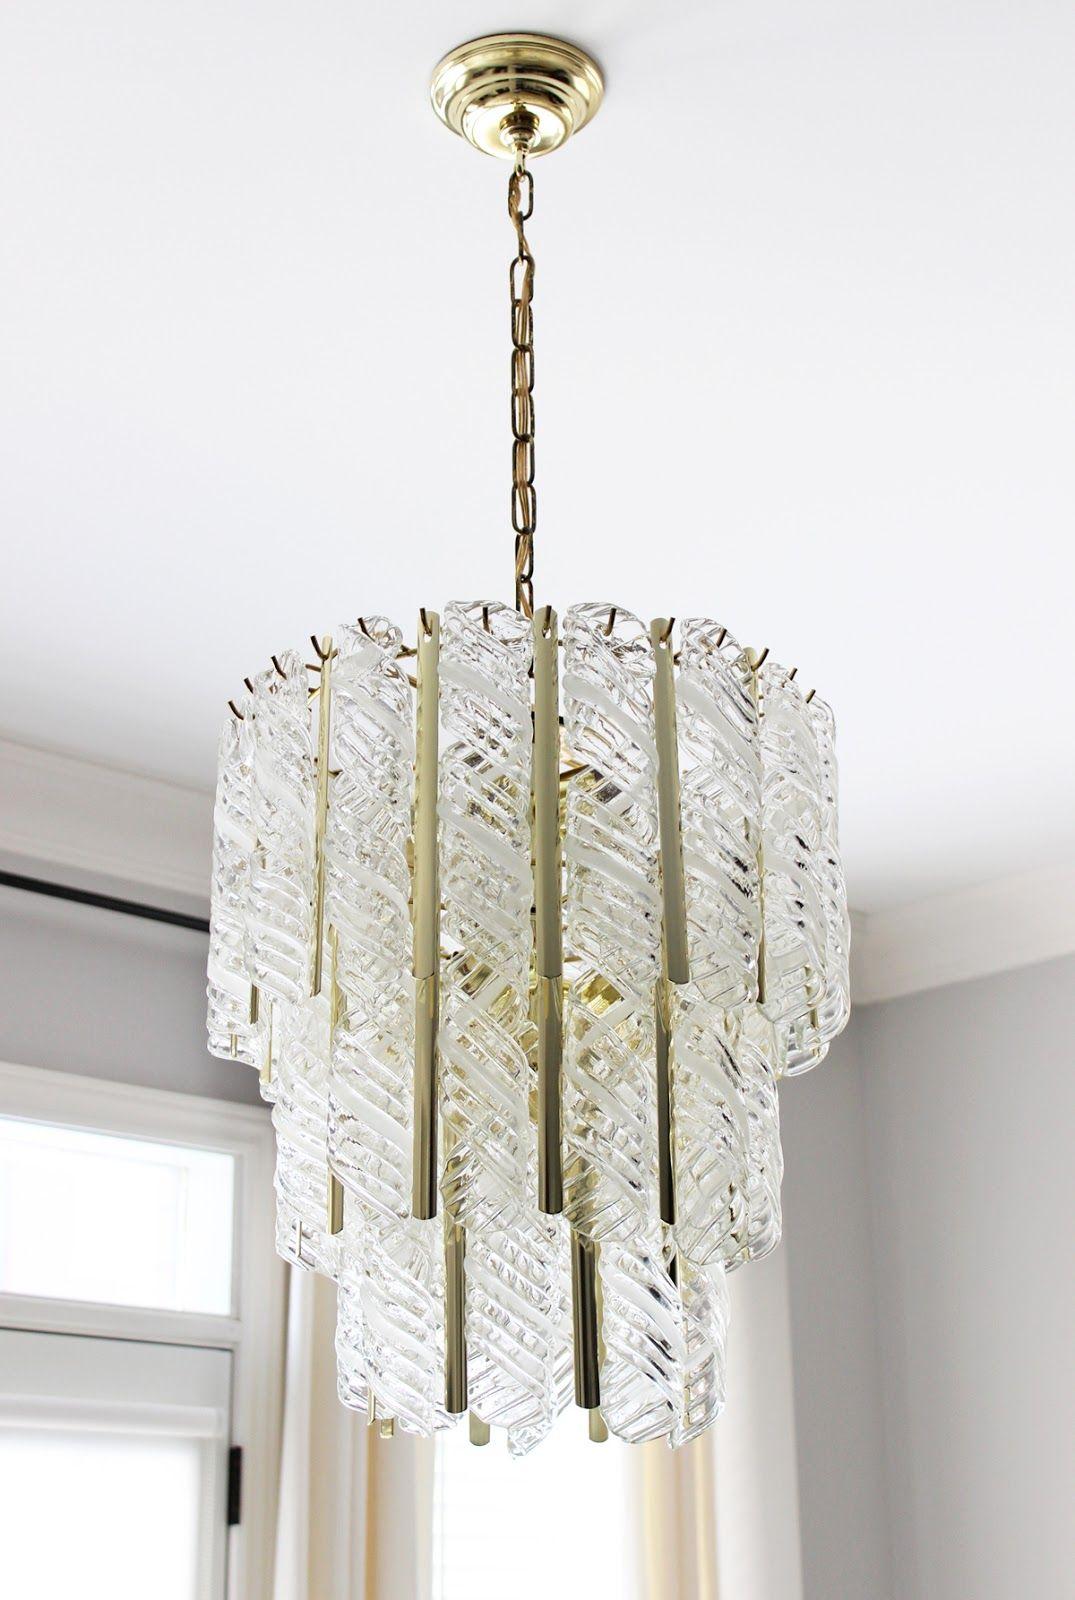 Vintage Venini Murano Glass chandelier - Vintage Venini Murano Glass Chandelier AM Dolce Vita Pinterest